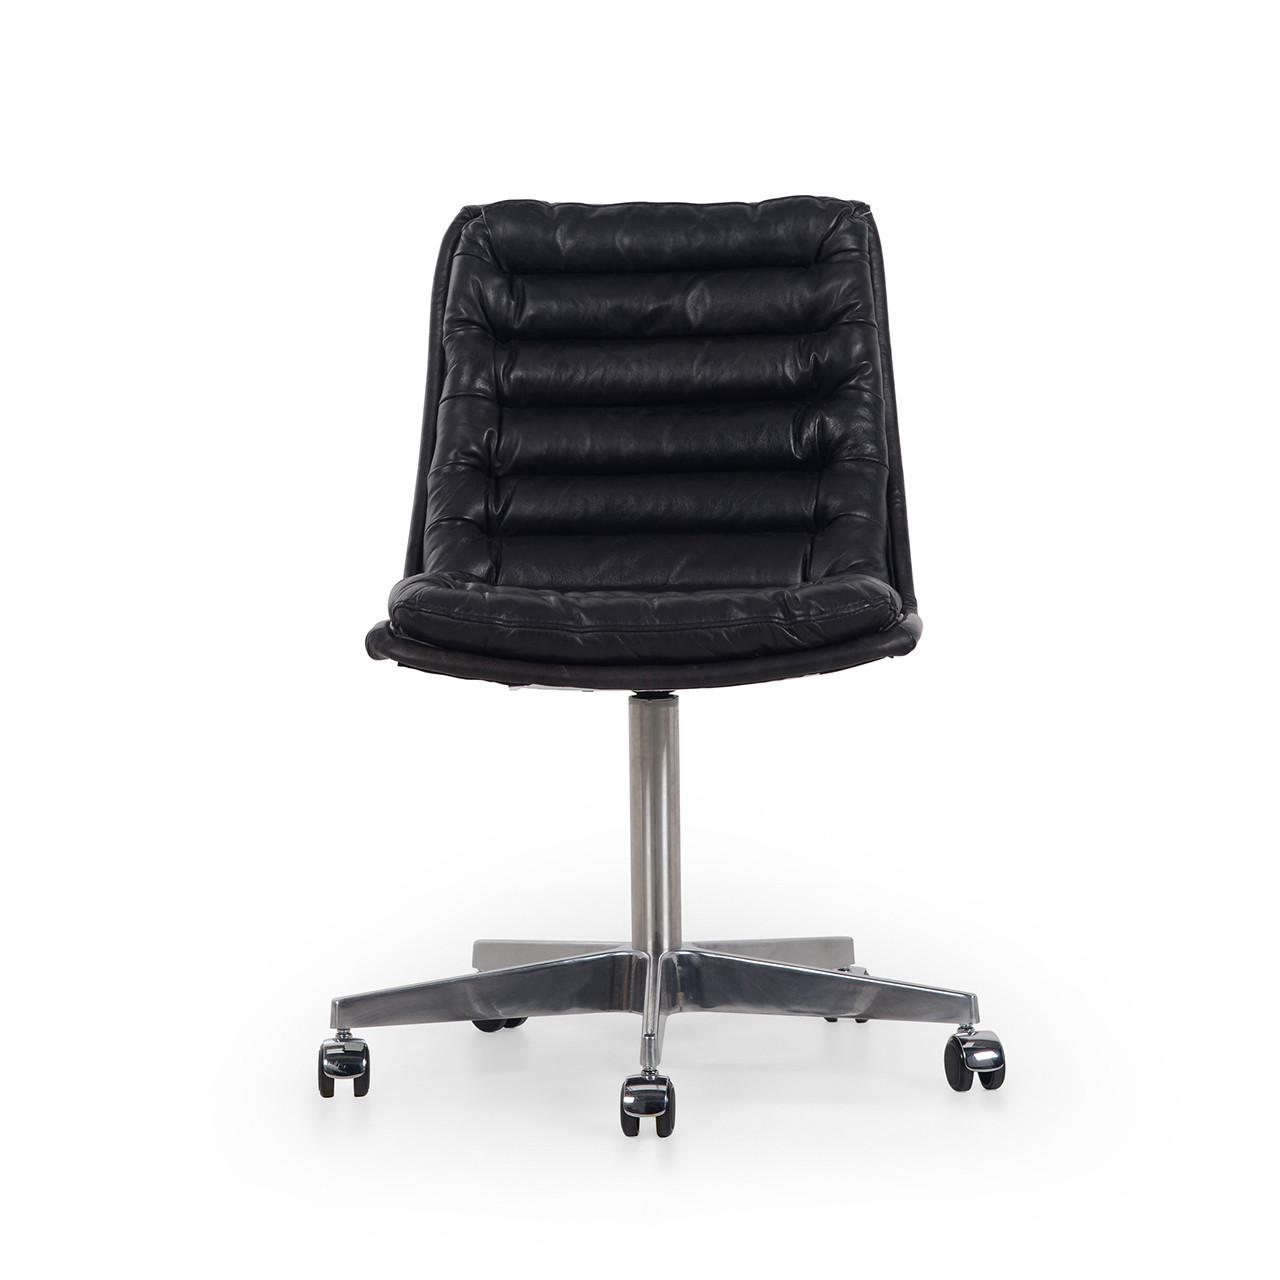 Malibu Desk Chair - Rider Black